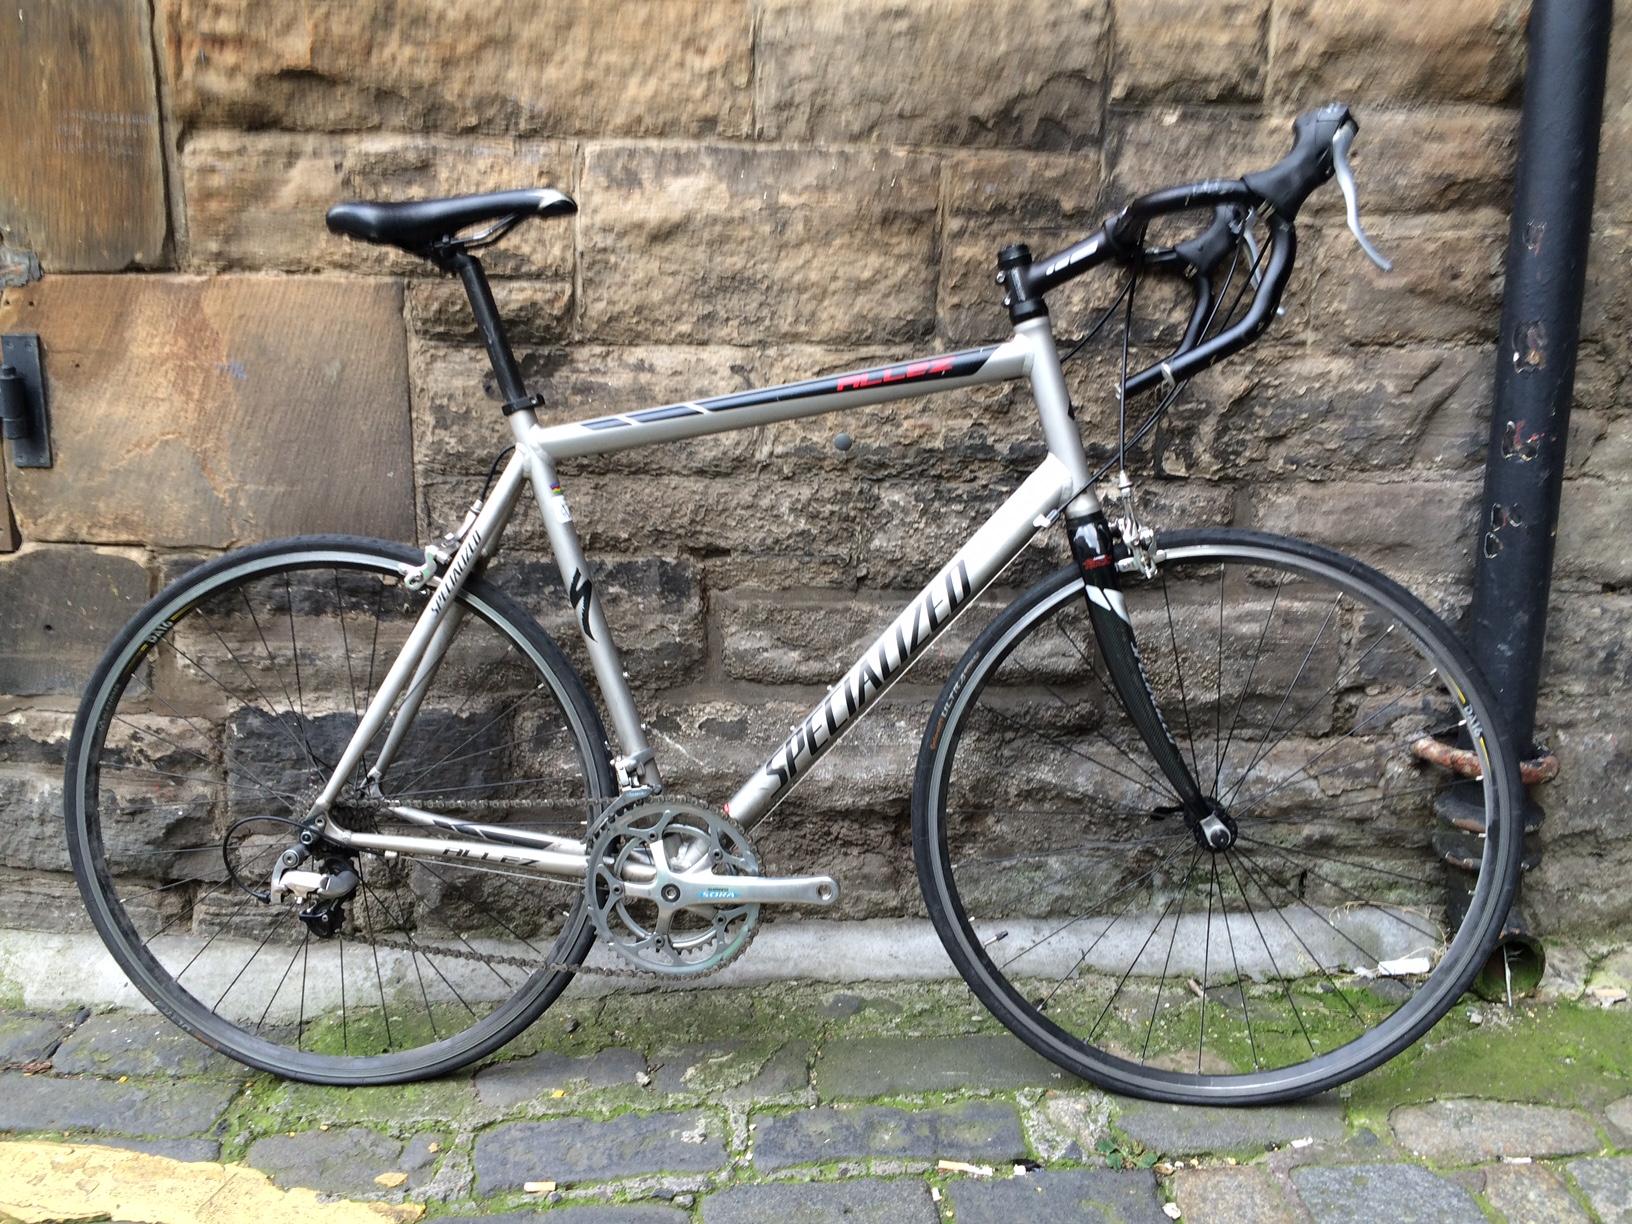 The donor bike